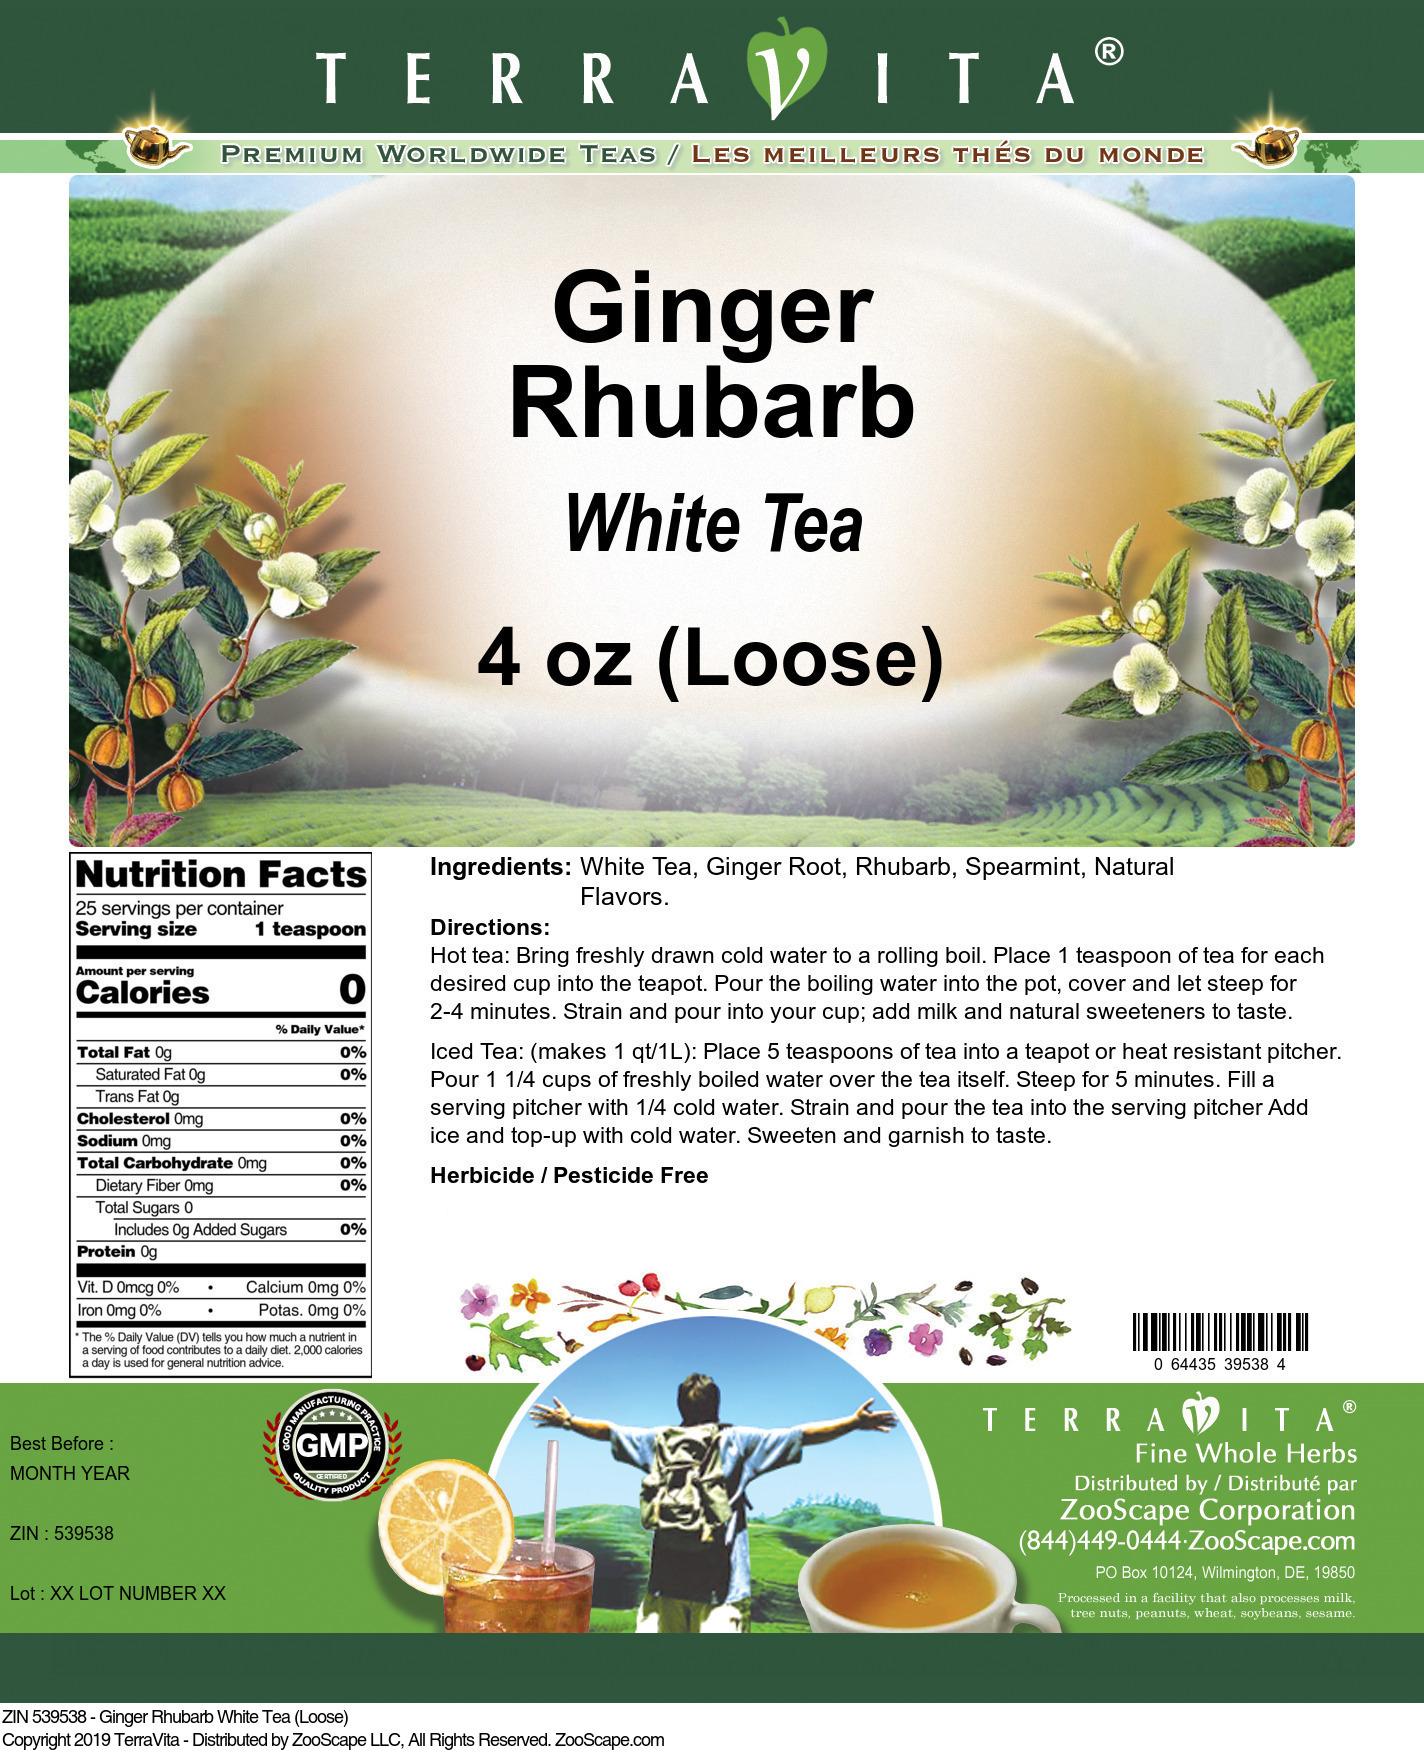 Ginger Rhubarb White Tea (Loose)